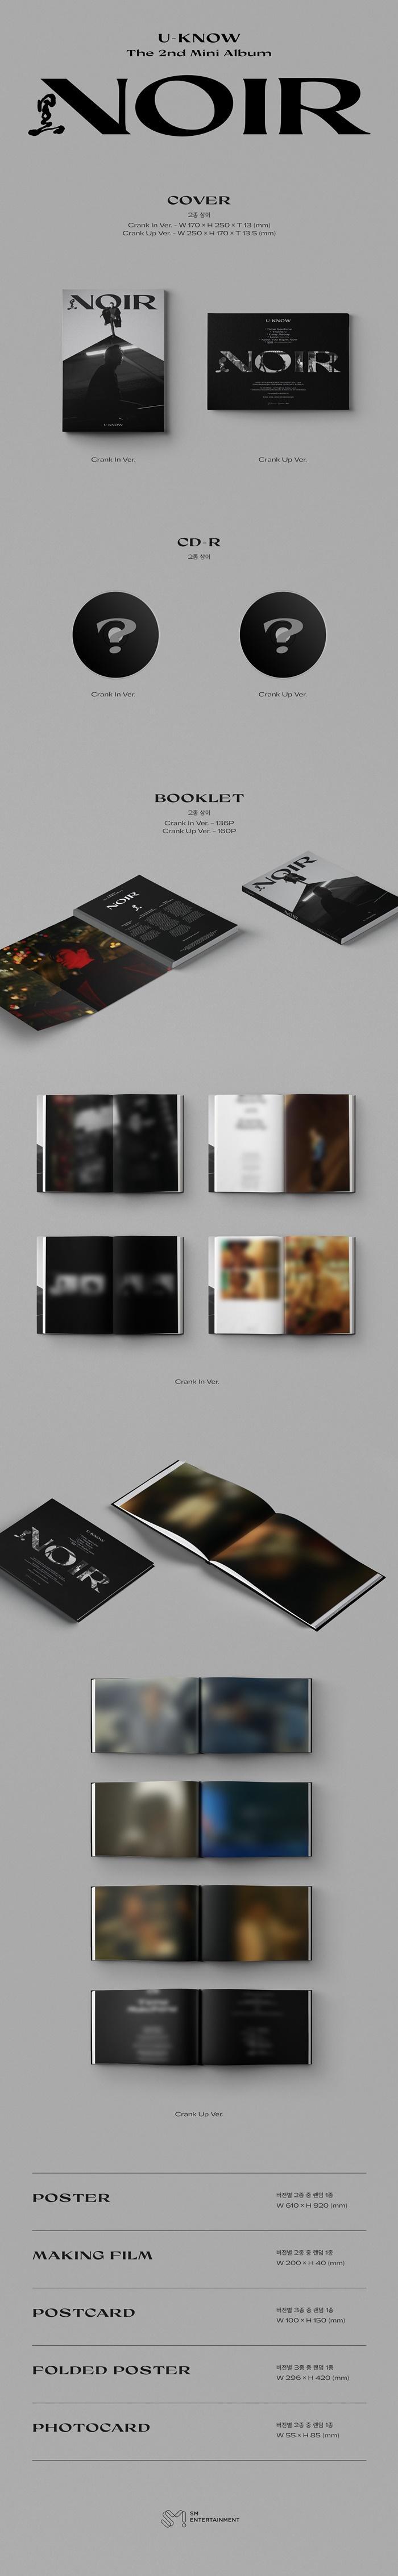 U-Know - 2nd Mini [NOIR] (Crank Up Ver.) + Poster